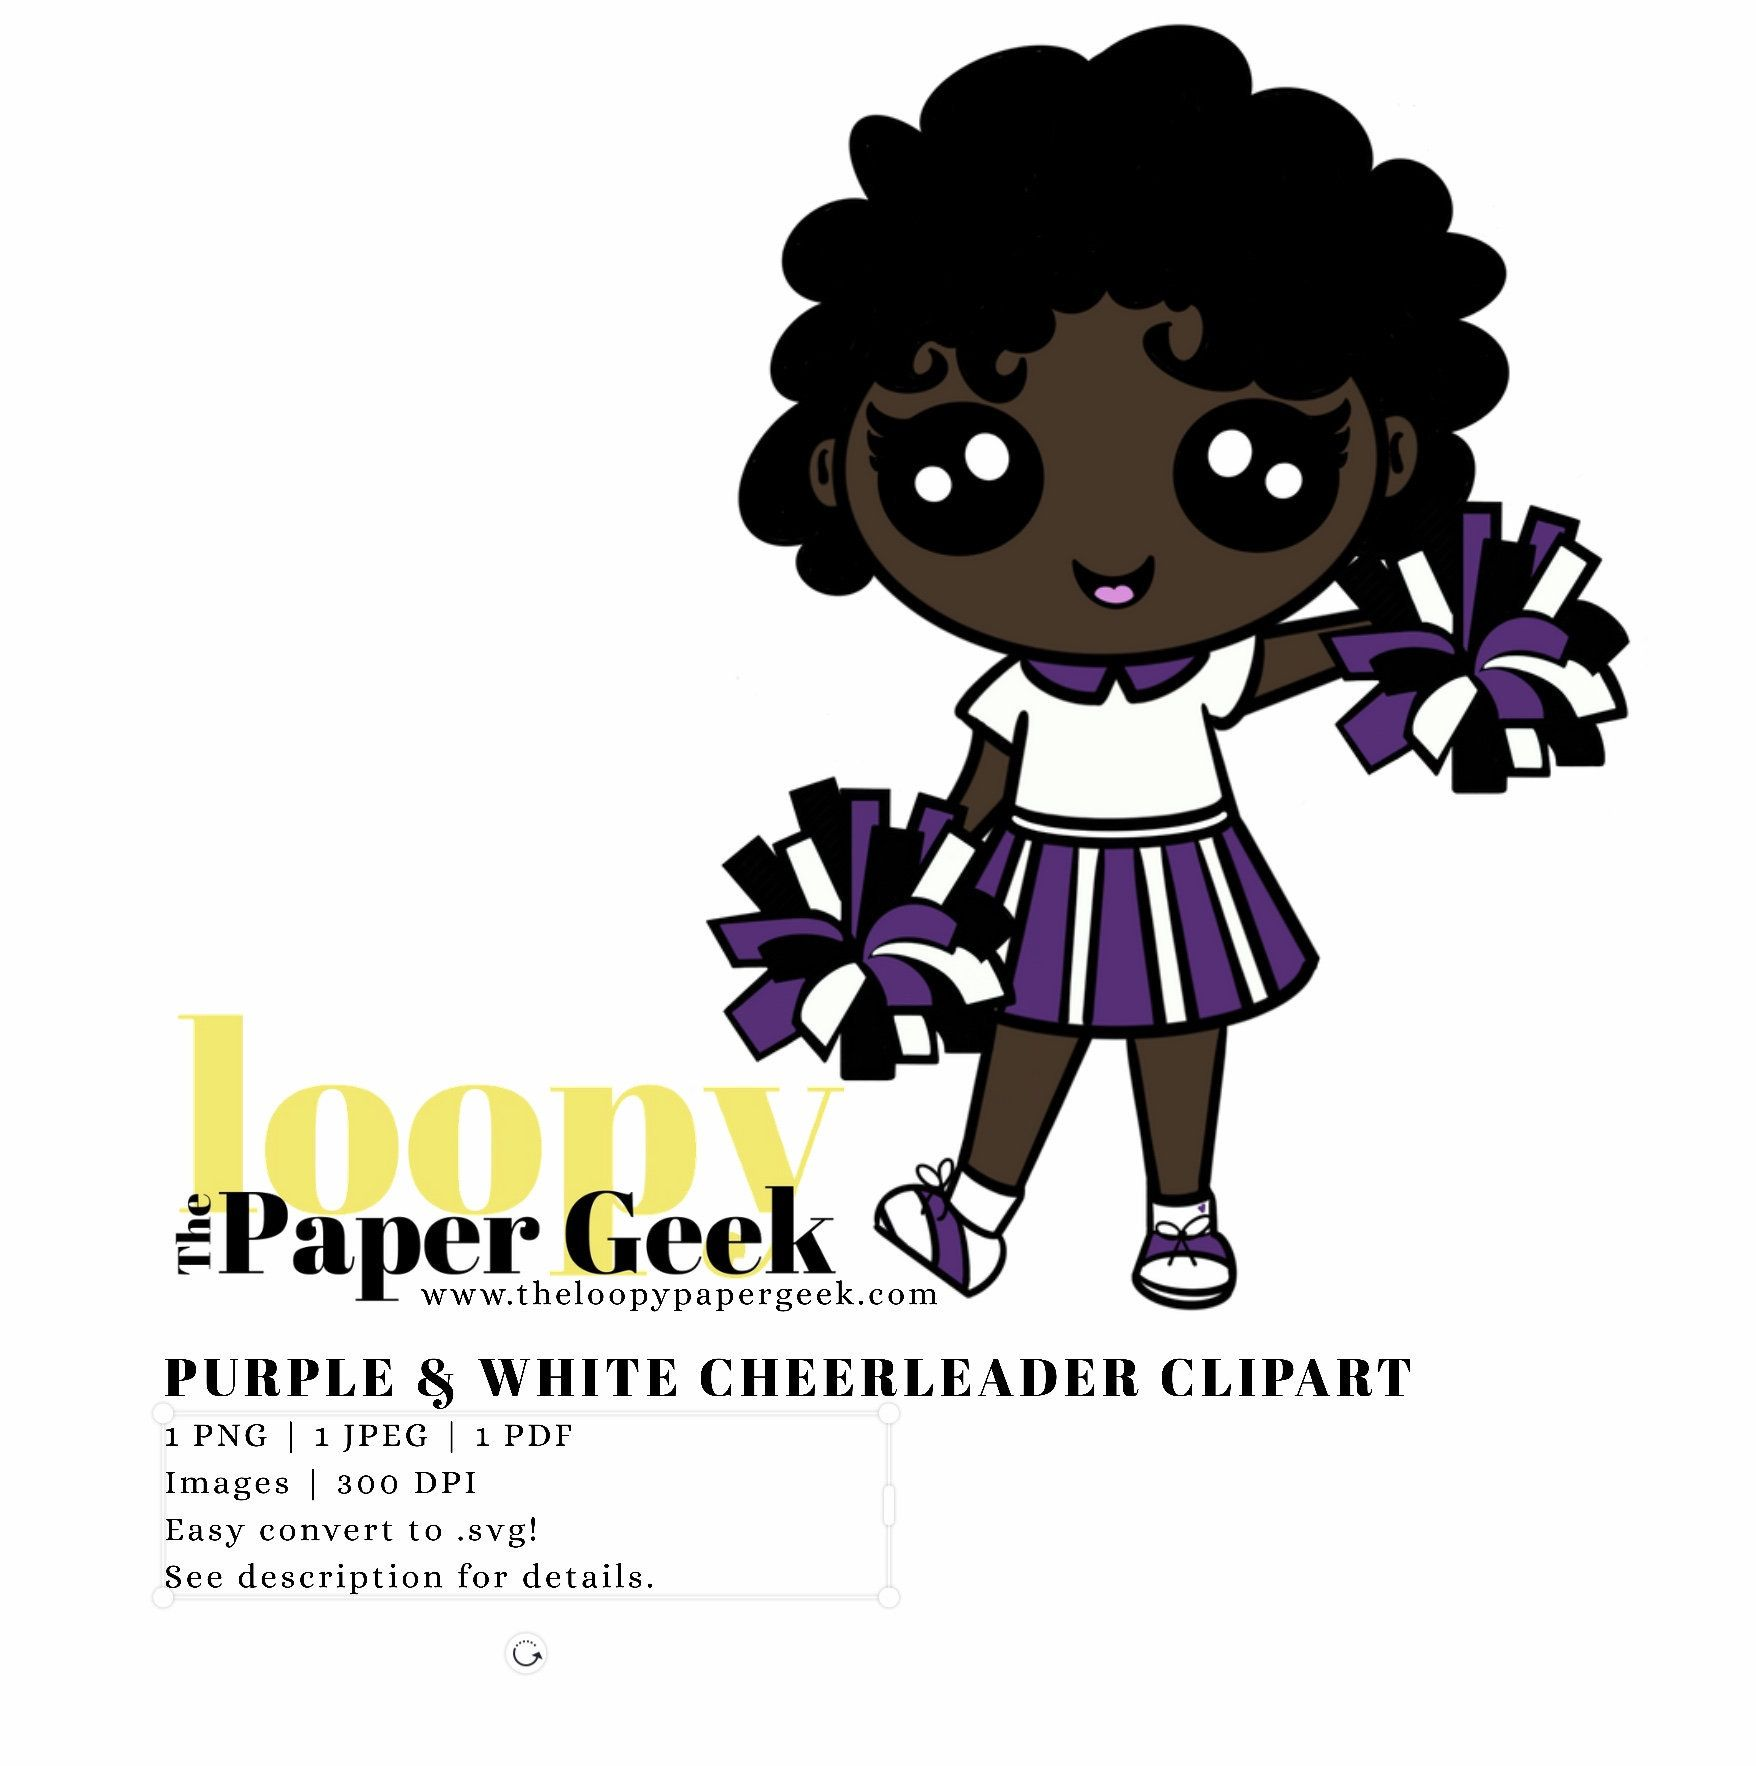 medium resolution of purple and white cheerleader clipart illustration easy convert to svg